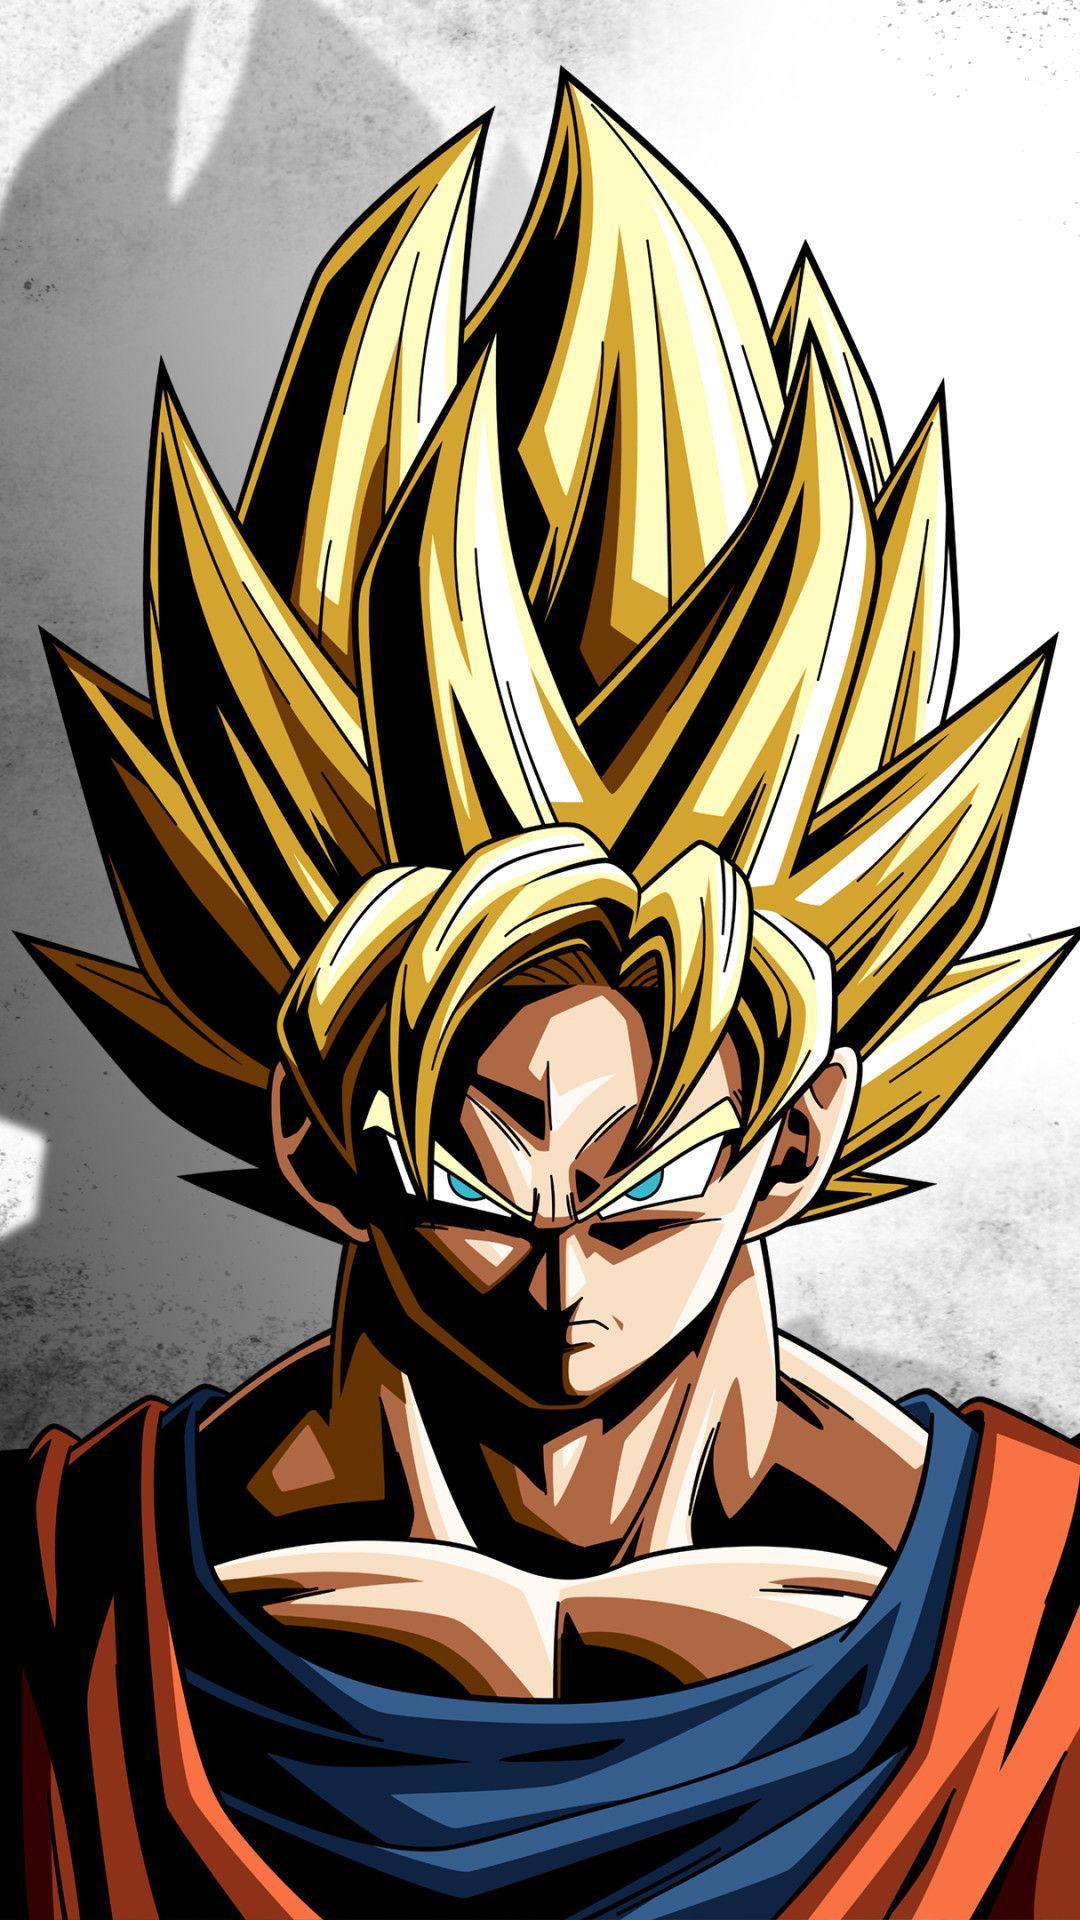 HD Wallpaper Son Goku Dragon Ball Super in 2020 Dragon